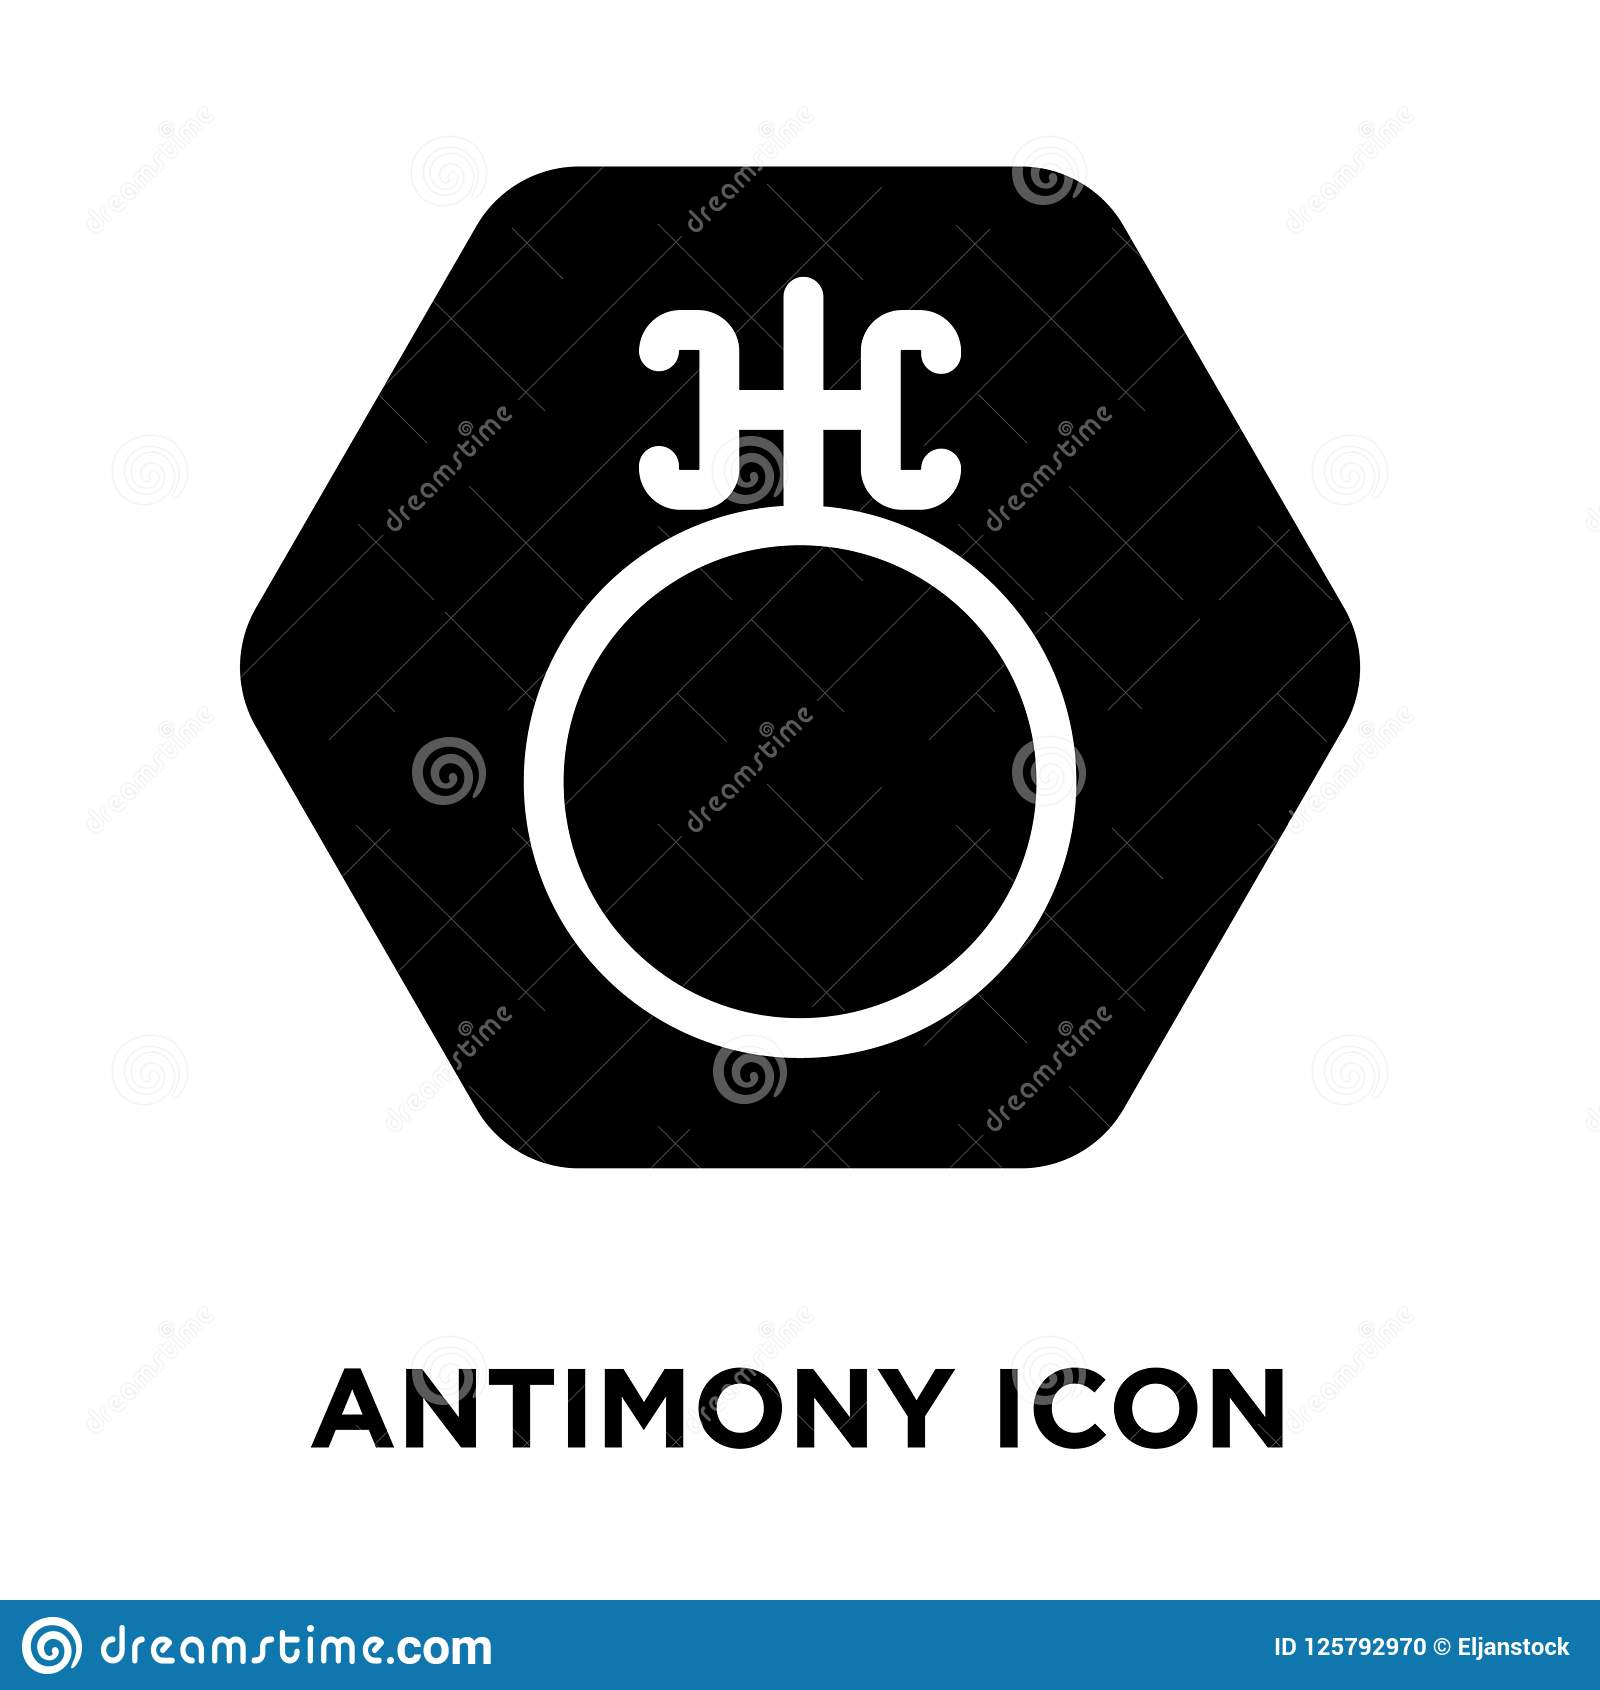 Antimony Icon Vector Isolated On White Background Logo Concept